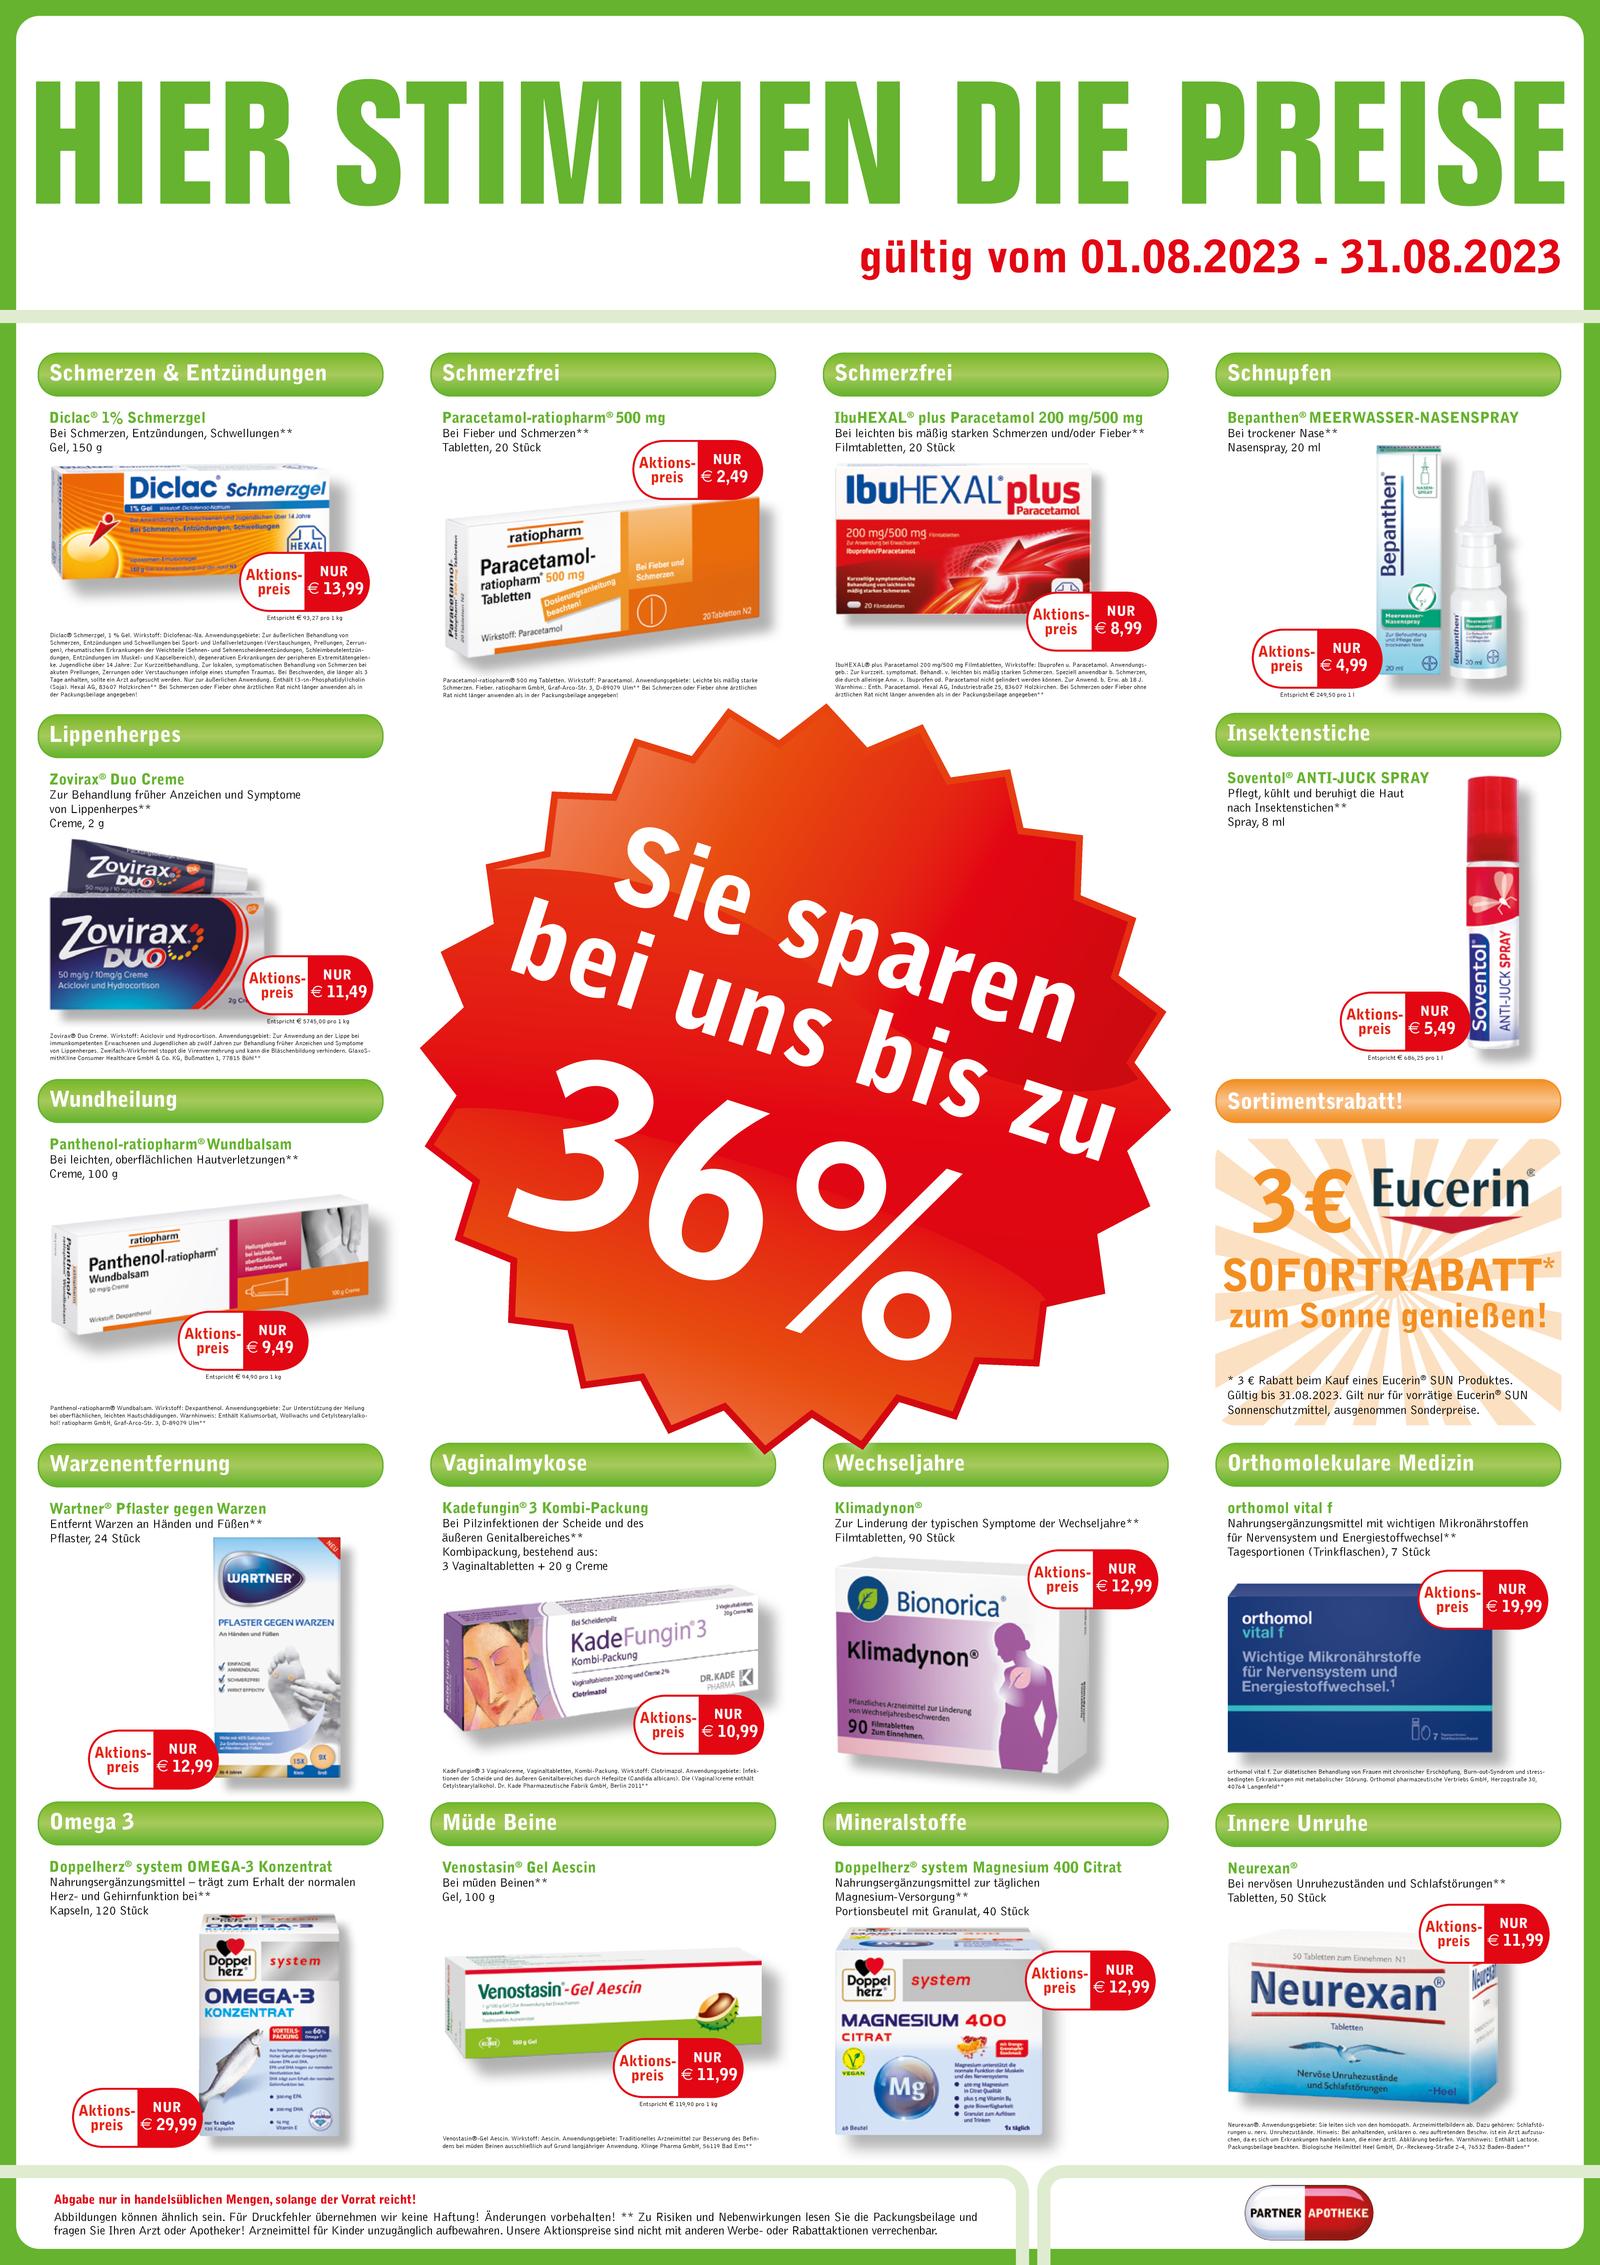 https://mein-uploads.apocdn.net/15463/leaflets/15463_flyer-Seite1.png